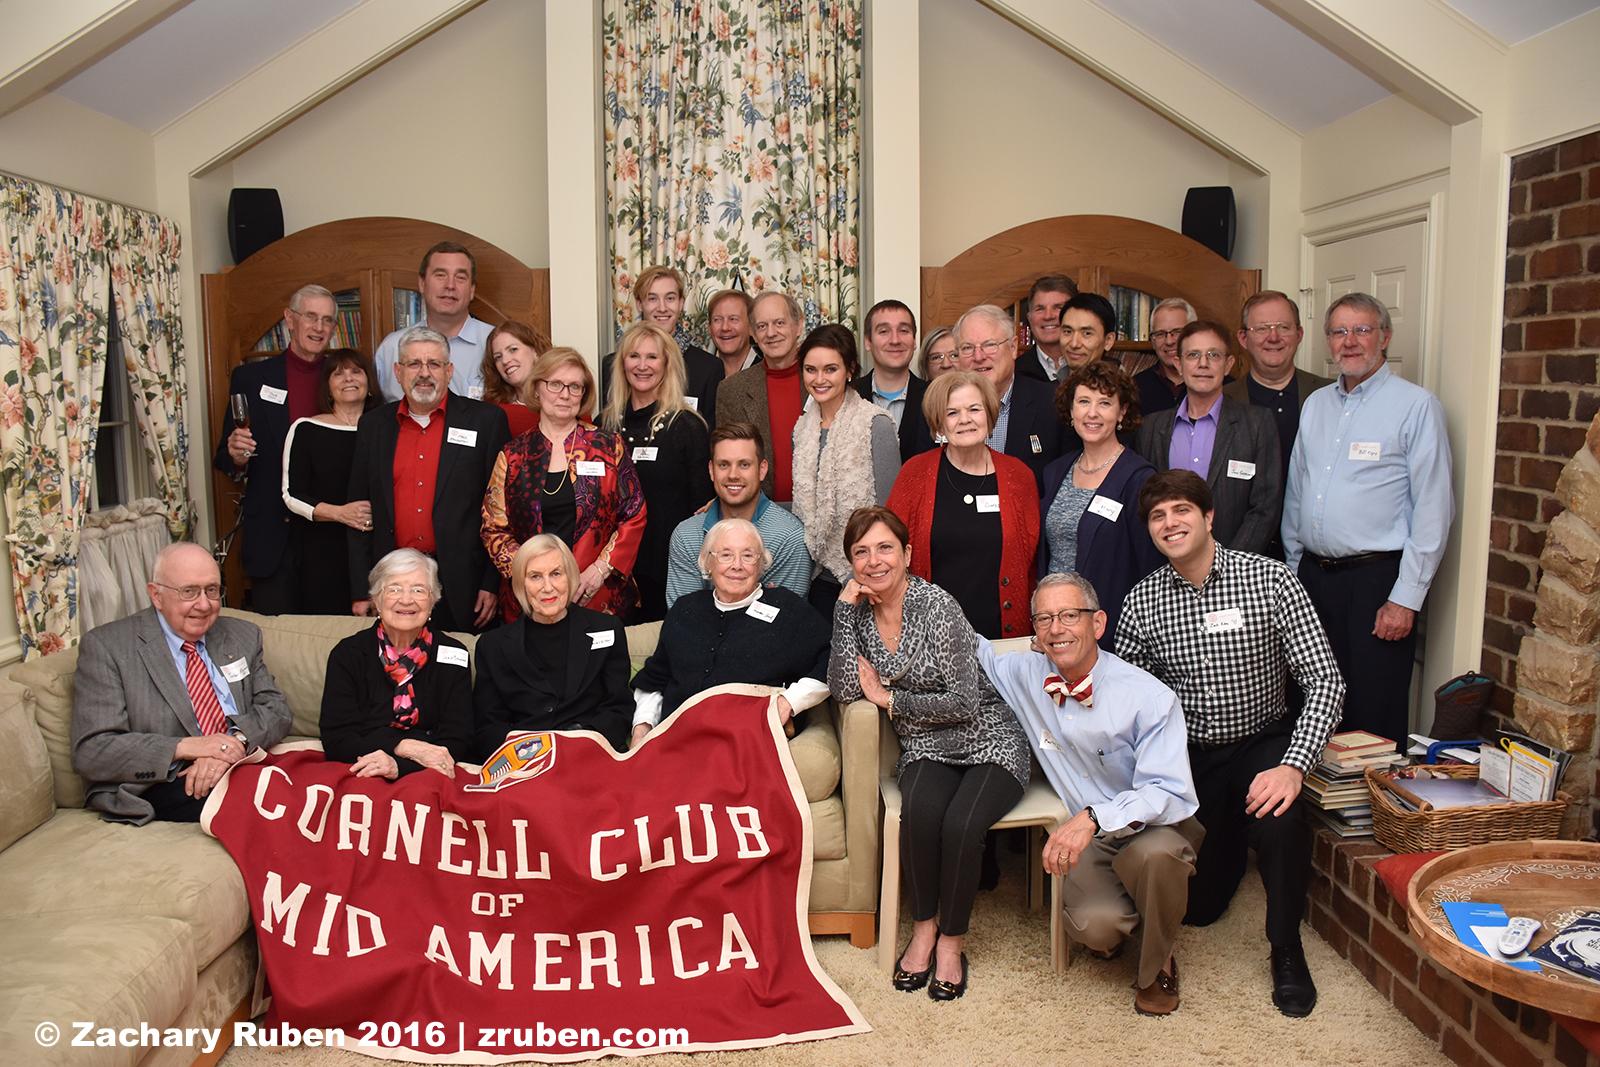 Cornell Club of Mid-America